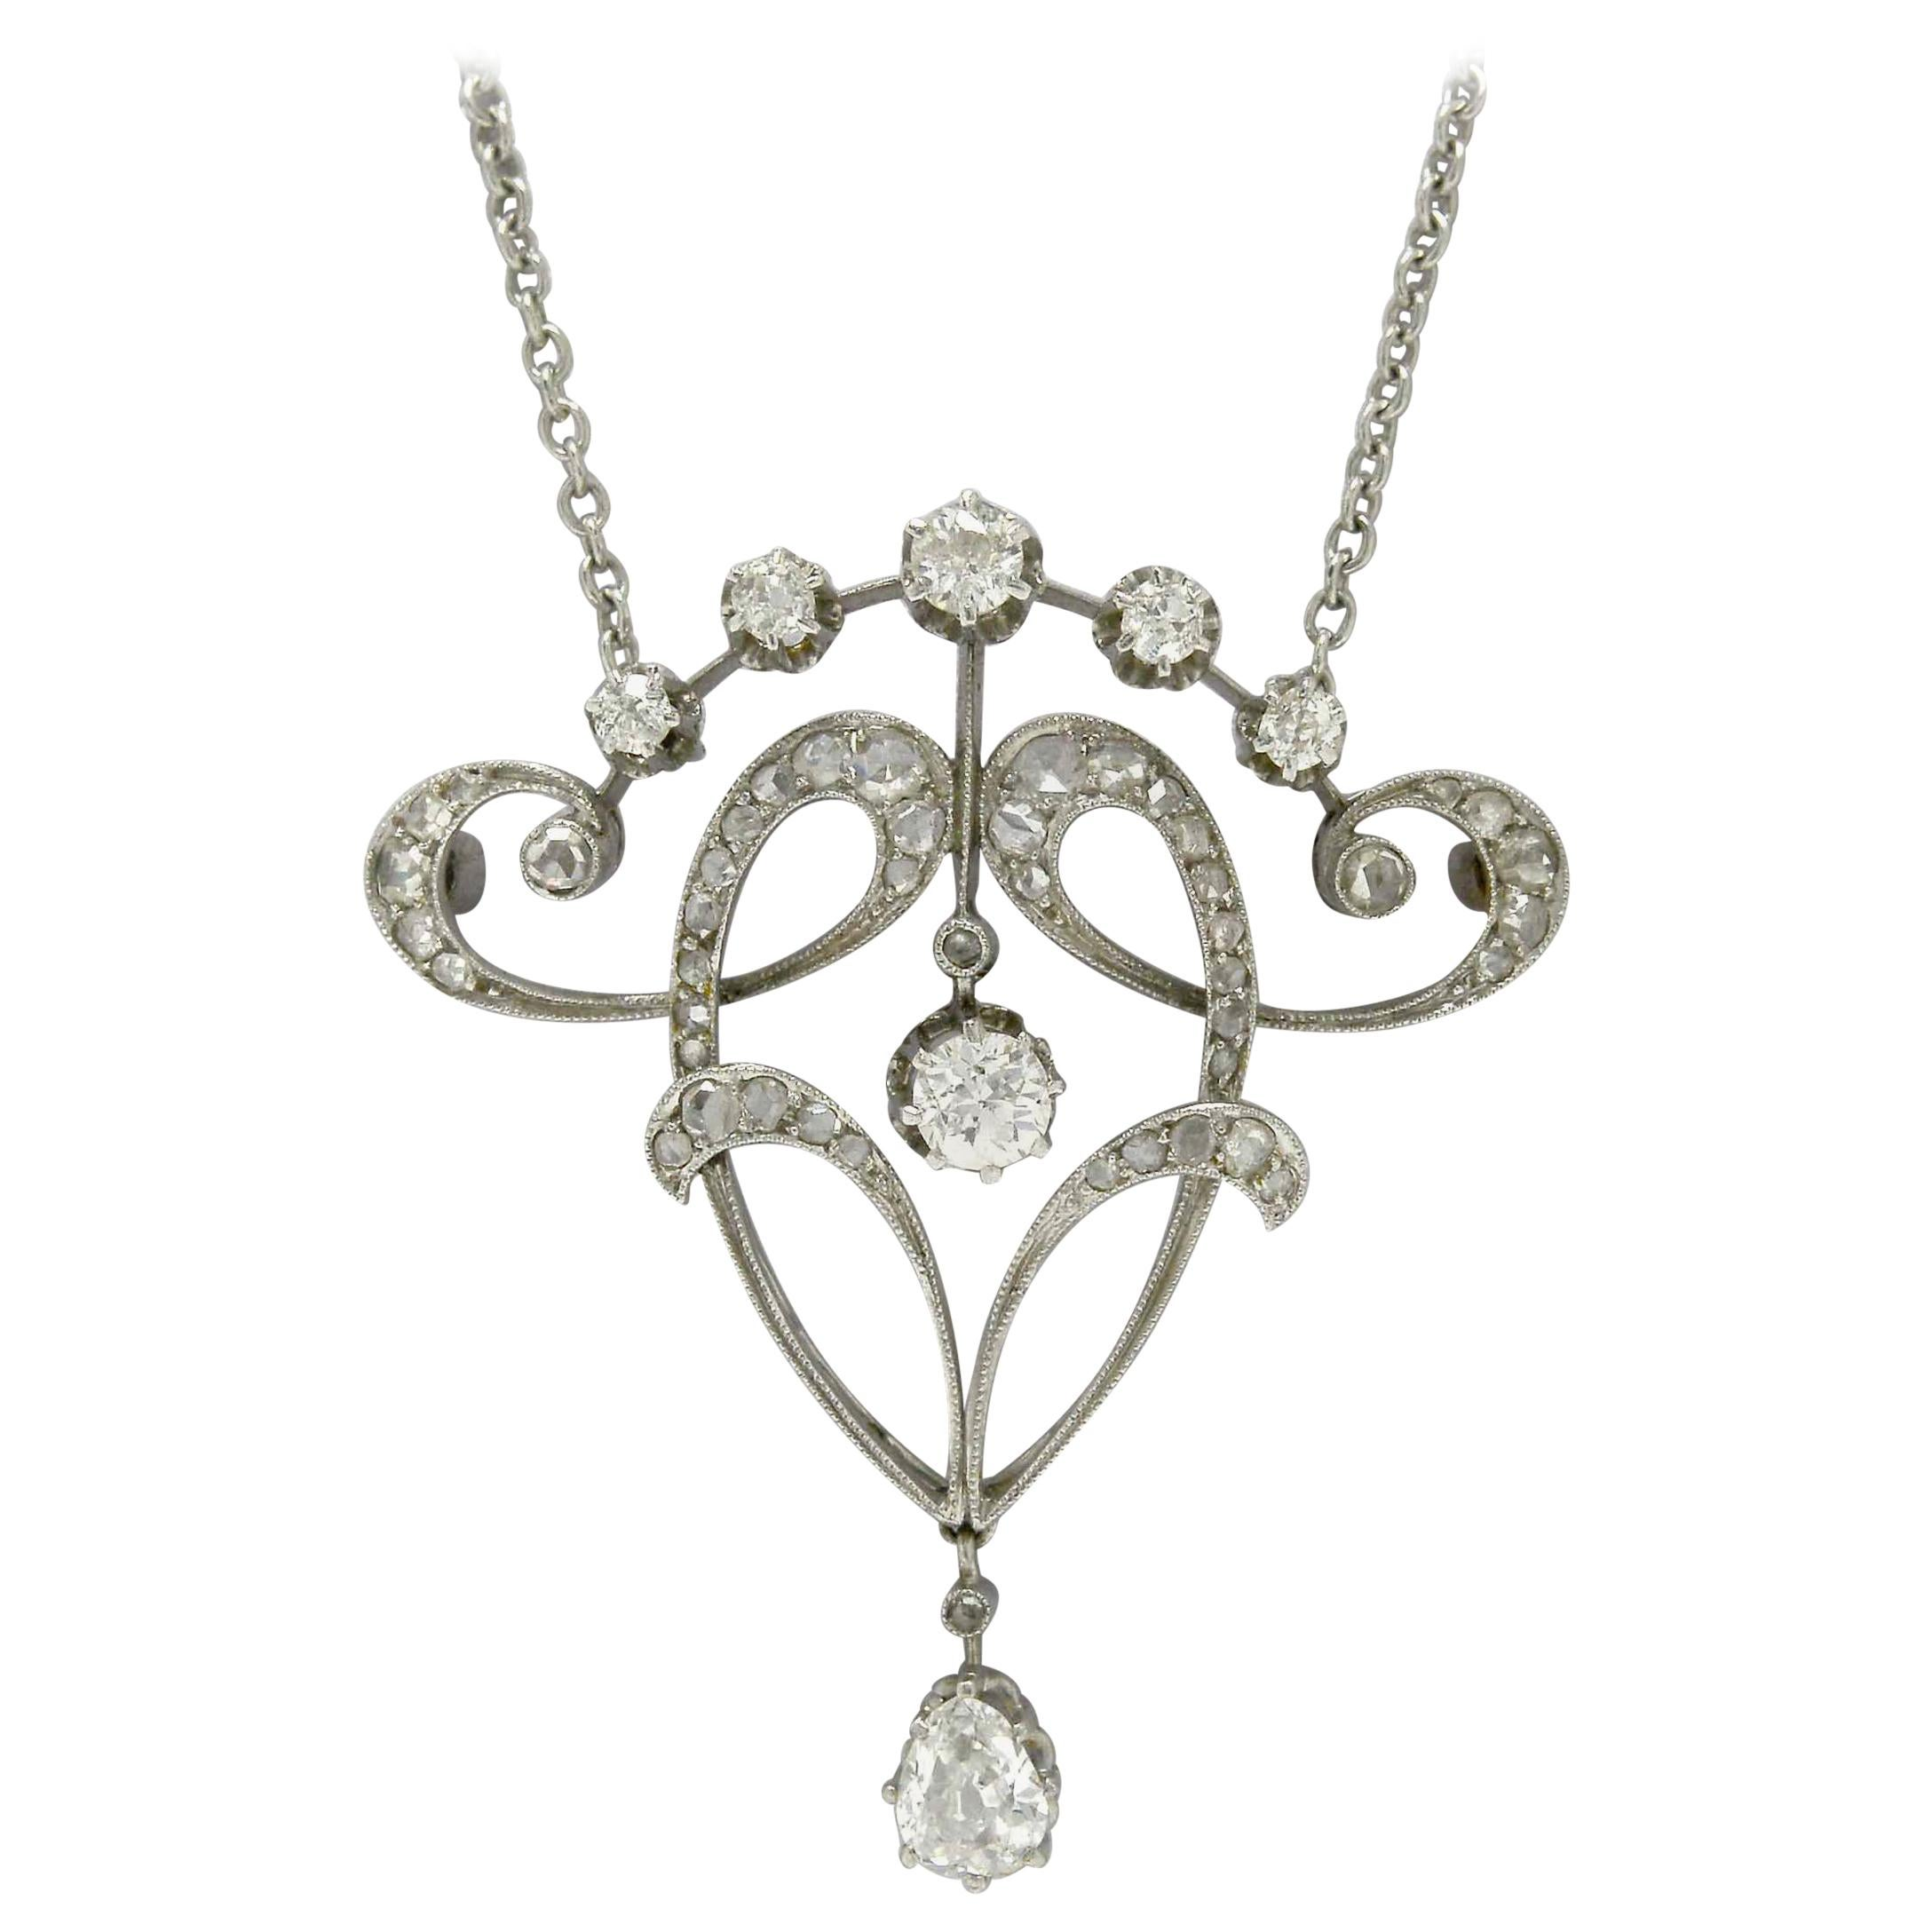 Original Antique Edwardian Diamond Necklace Pendant Lavalier Platinum circa 1900